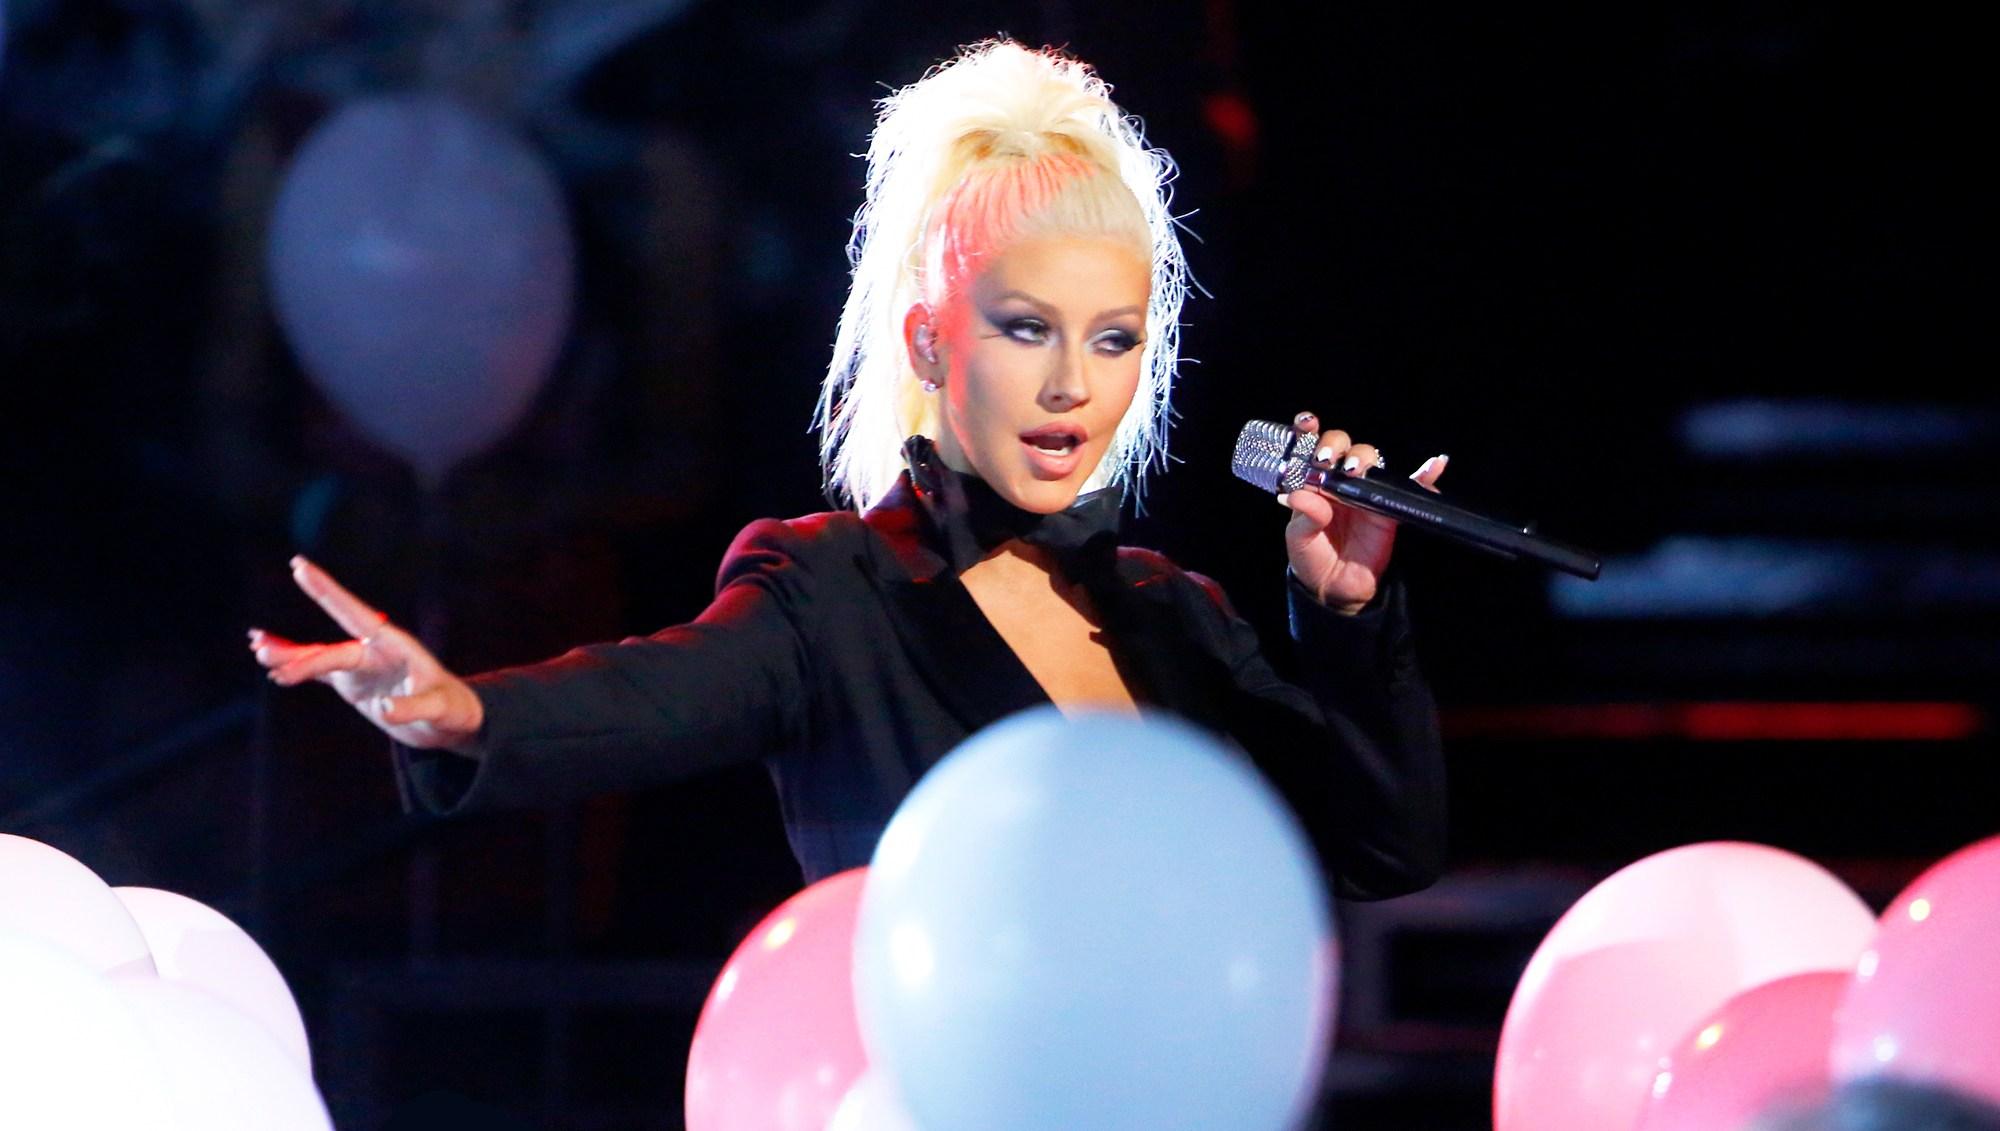 Christina Aguilera on 'The Voice'